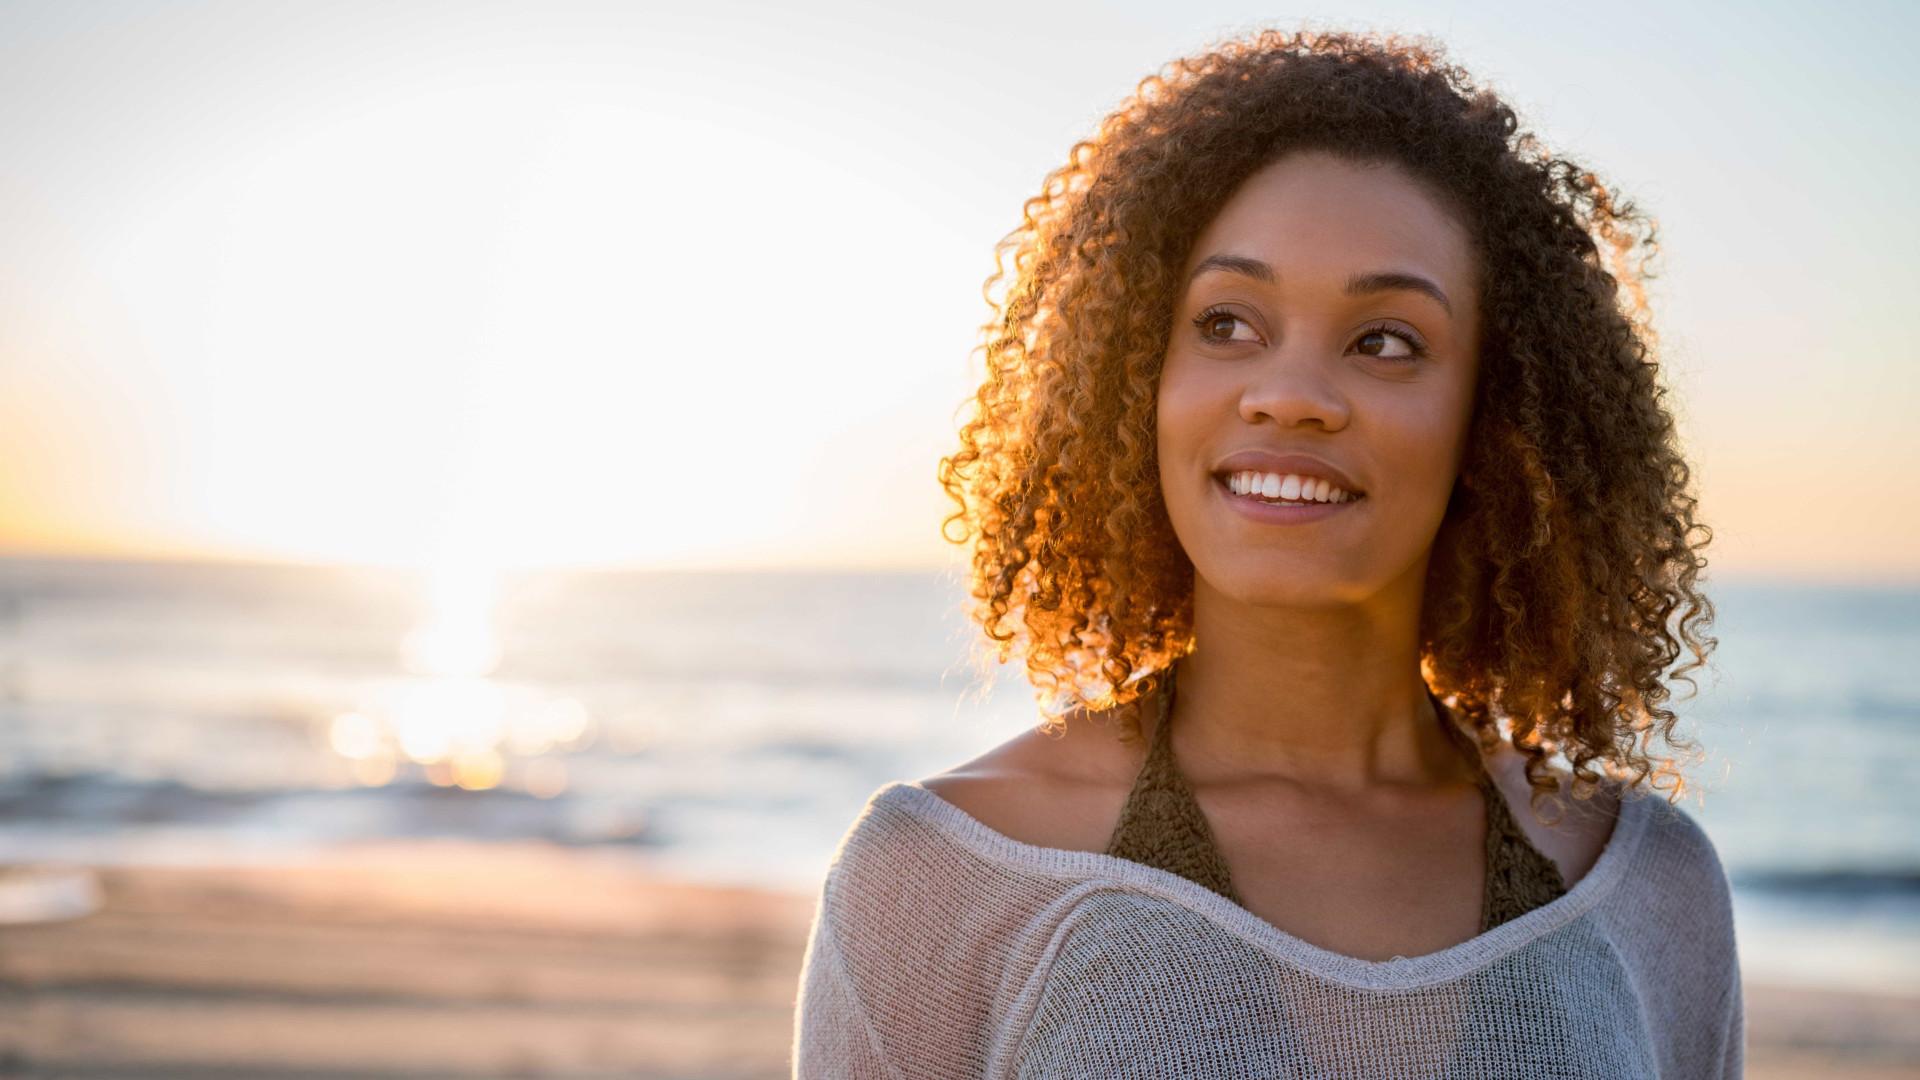 Descubra como minimizar os danos do sol e da água do mar ao cabelo